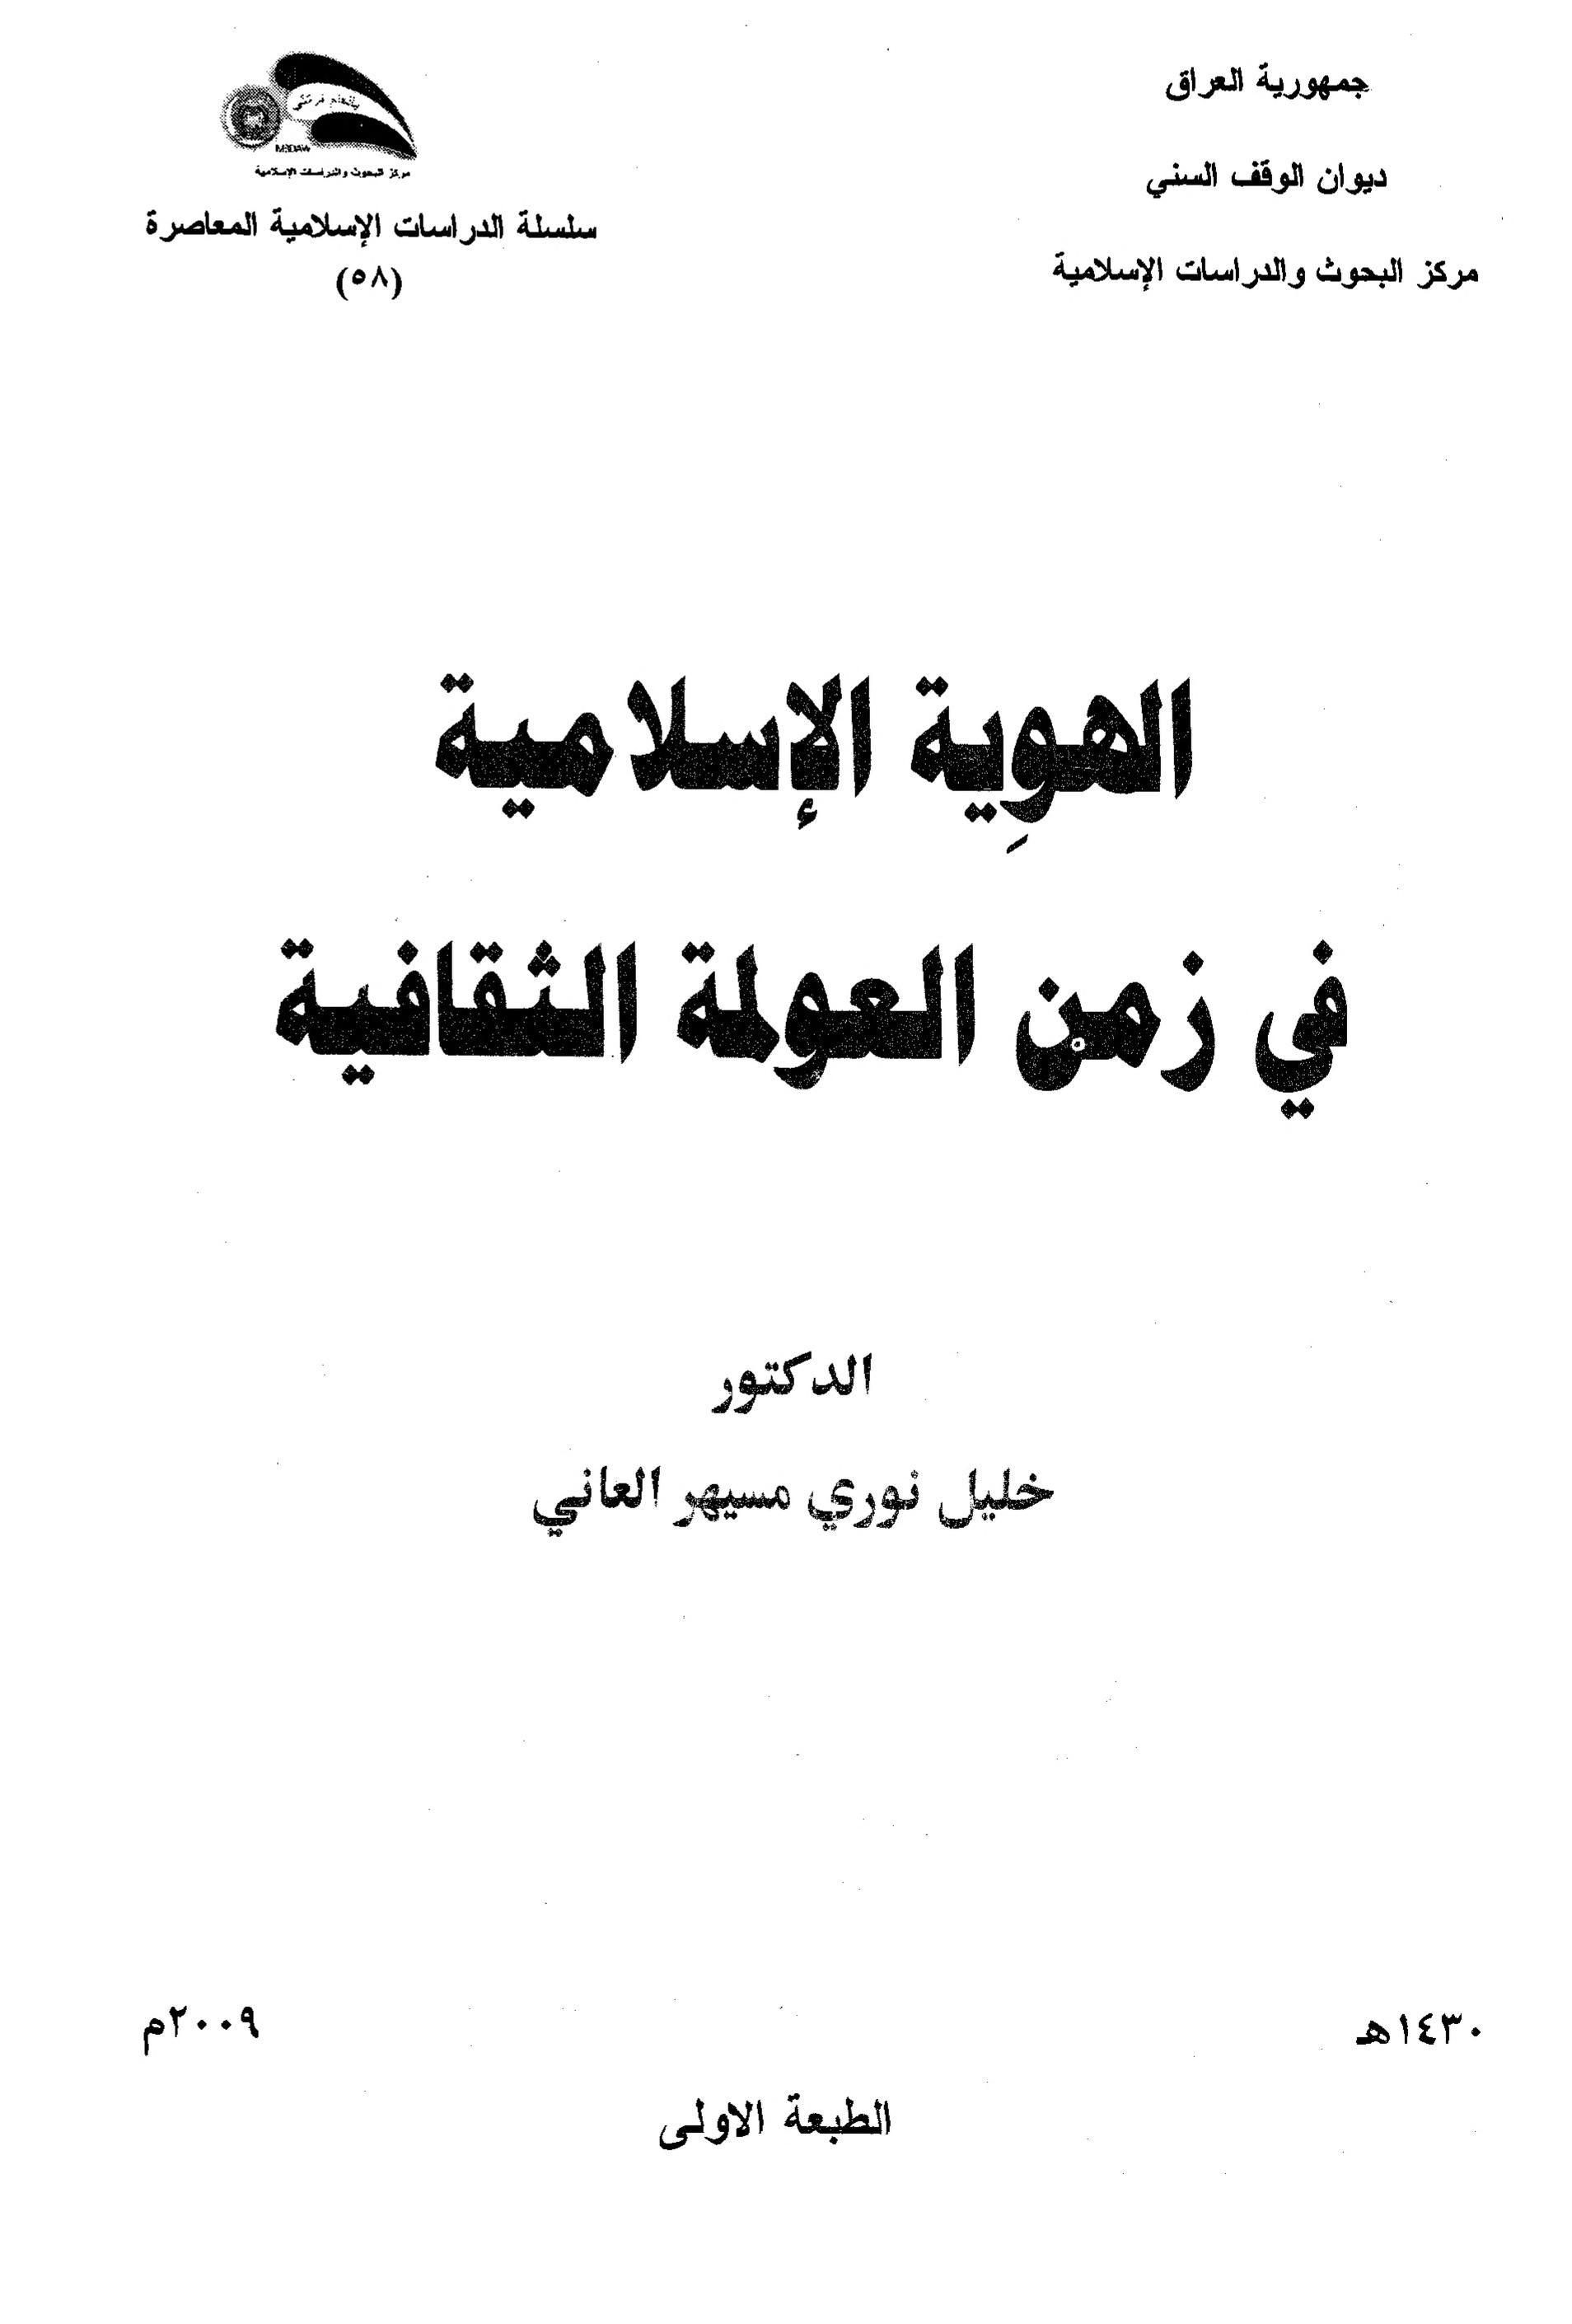 Https Archive Org Stream 20200607 20200607 0823 الهوية الاسلامية في زمن العولمة خليل نوري مسيهر العاني Internet Archive Math Math Equations